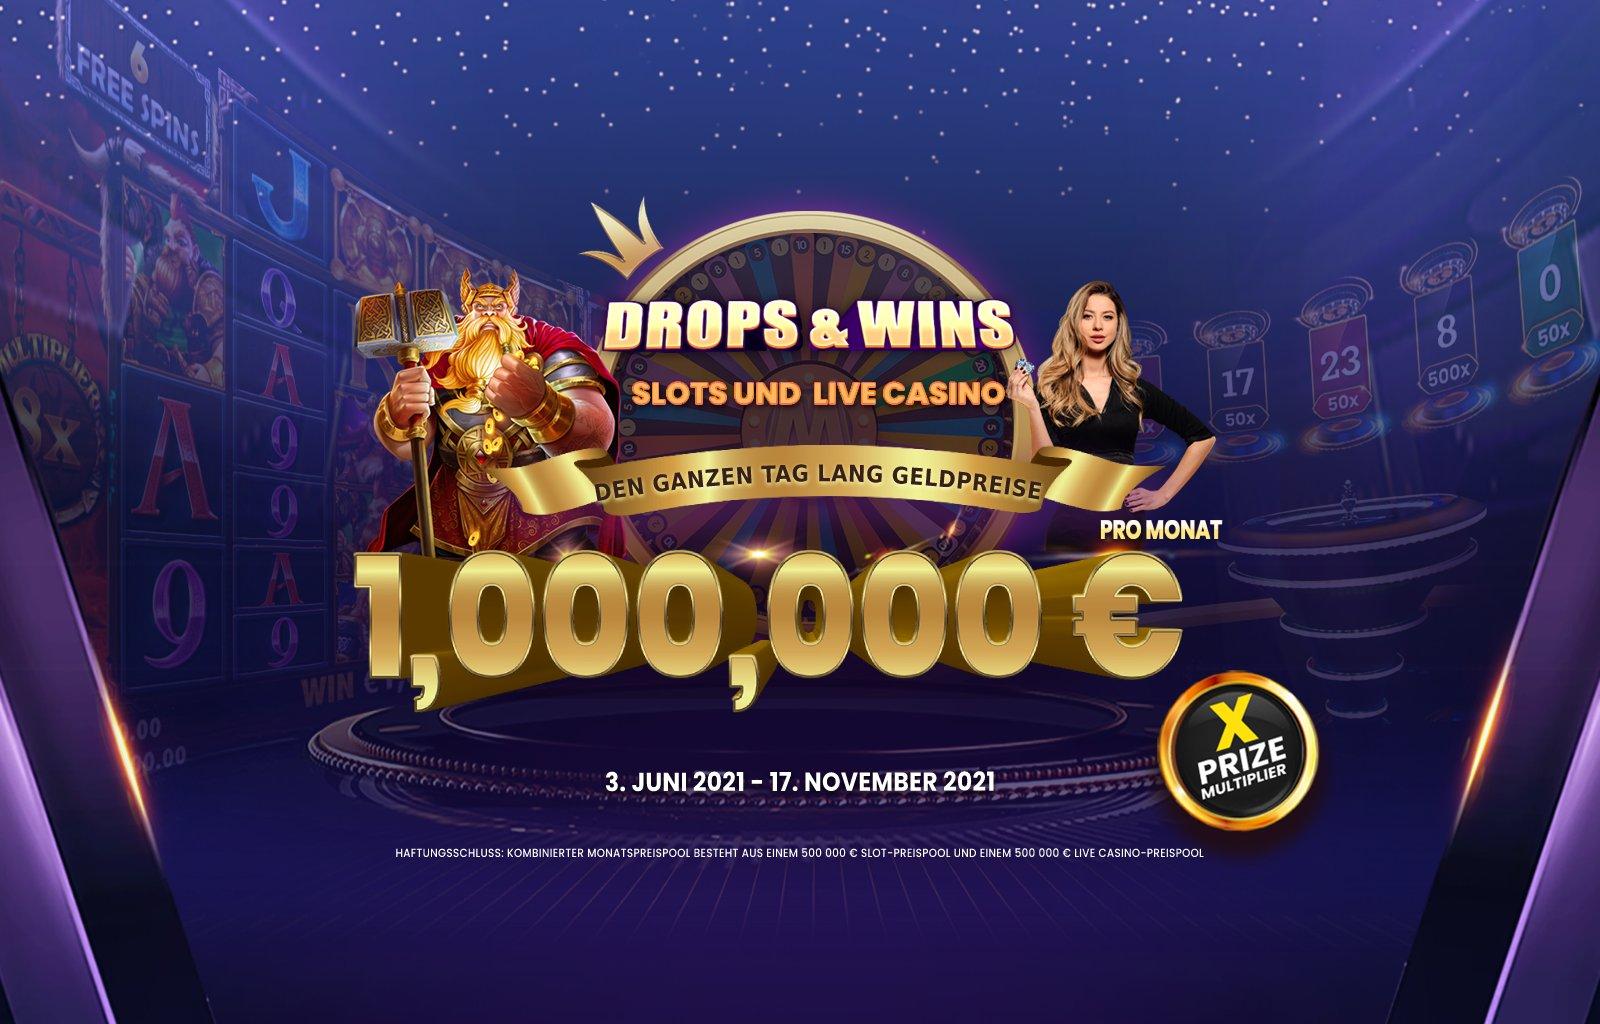 Drops and Wins desktop banner